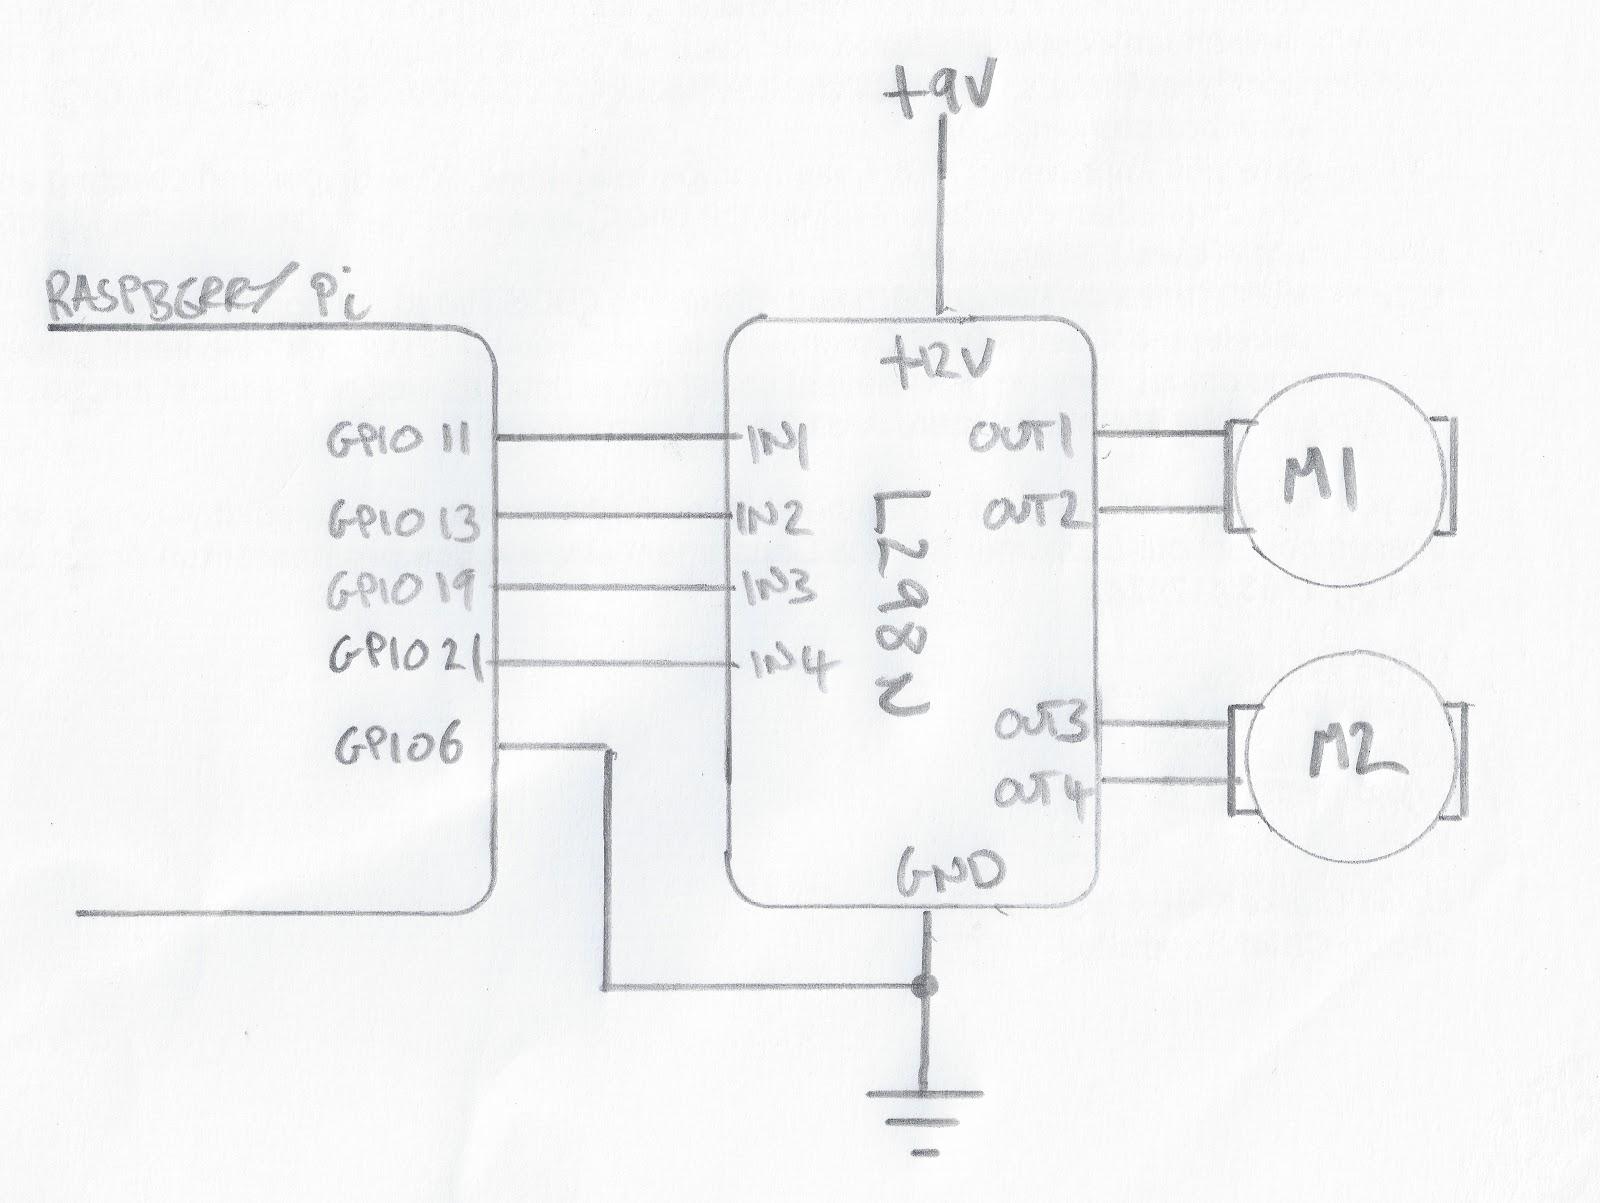 raspberry pi wiring diagram n